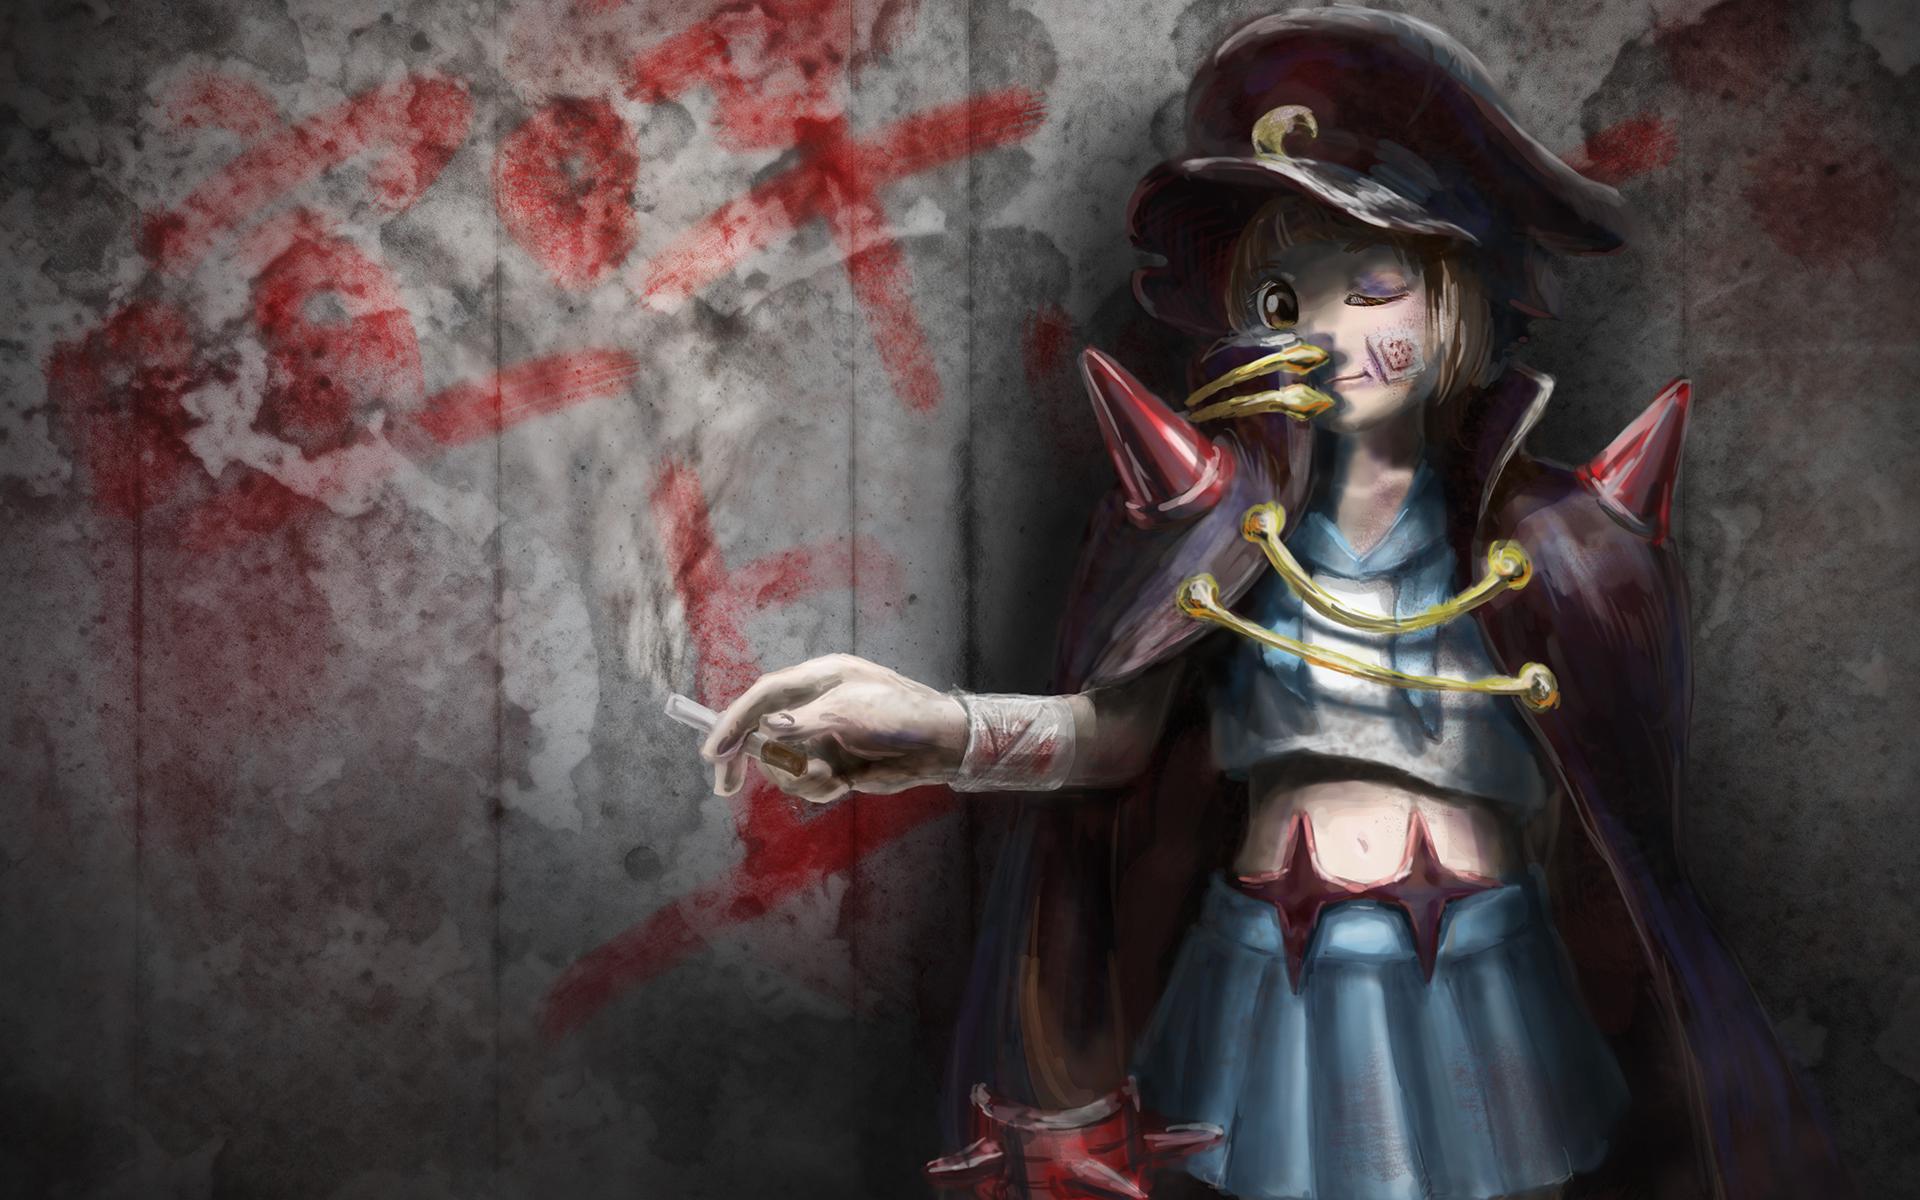 mako mankanshoku kill la kill girl anime hd wallpaper 1920x1200 1920x1200